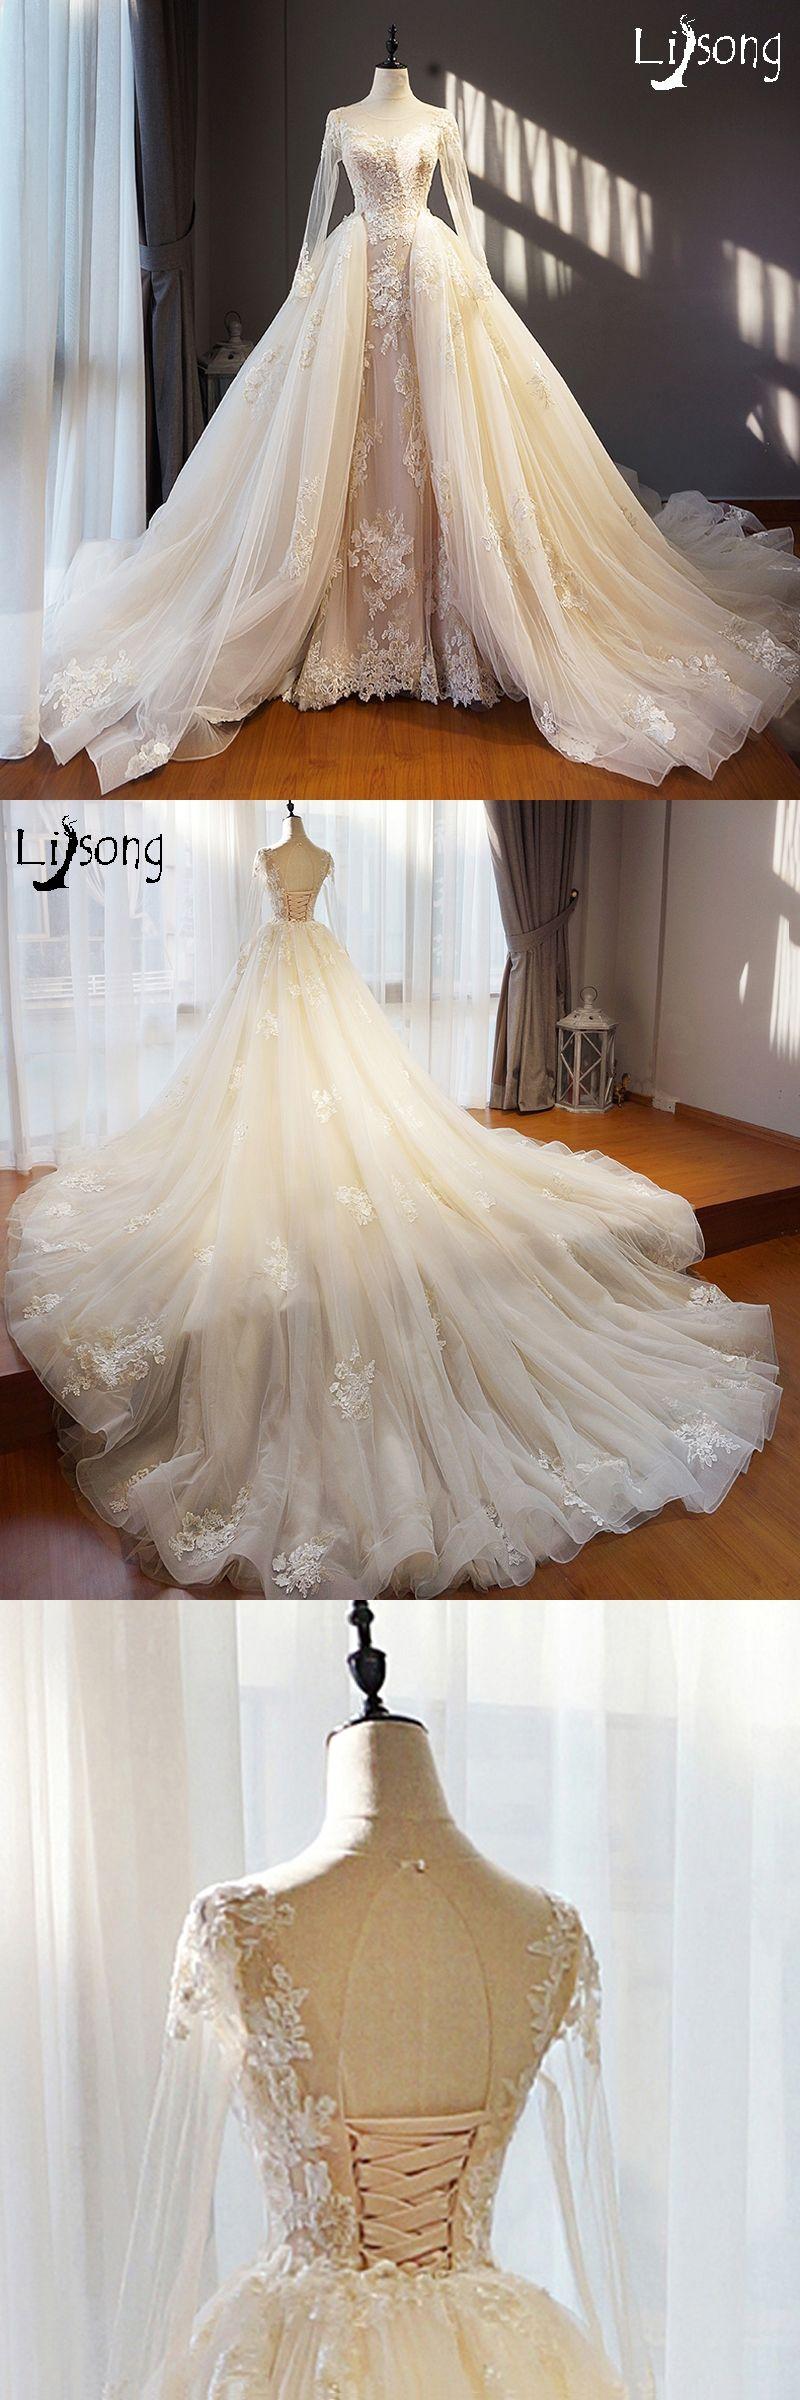 Champagne and ivory wedding dress  Light Champagne Ivory Unique Wedding Dress Long Removable Train Hem